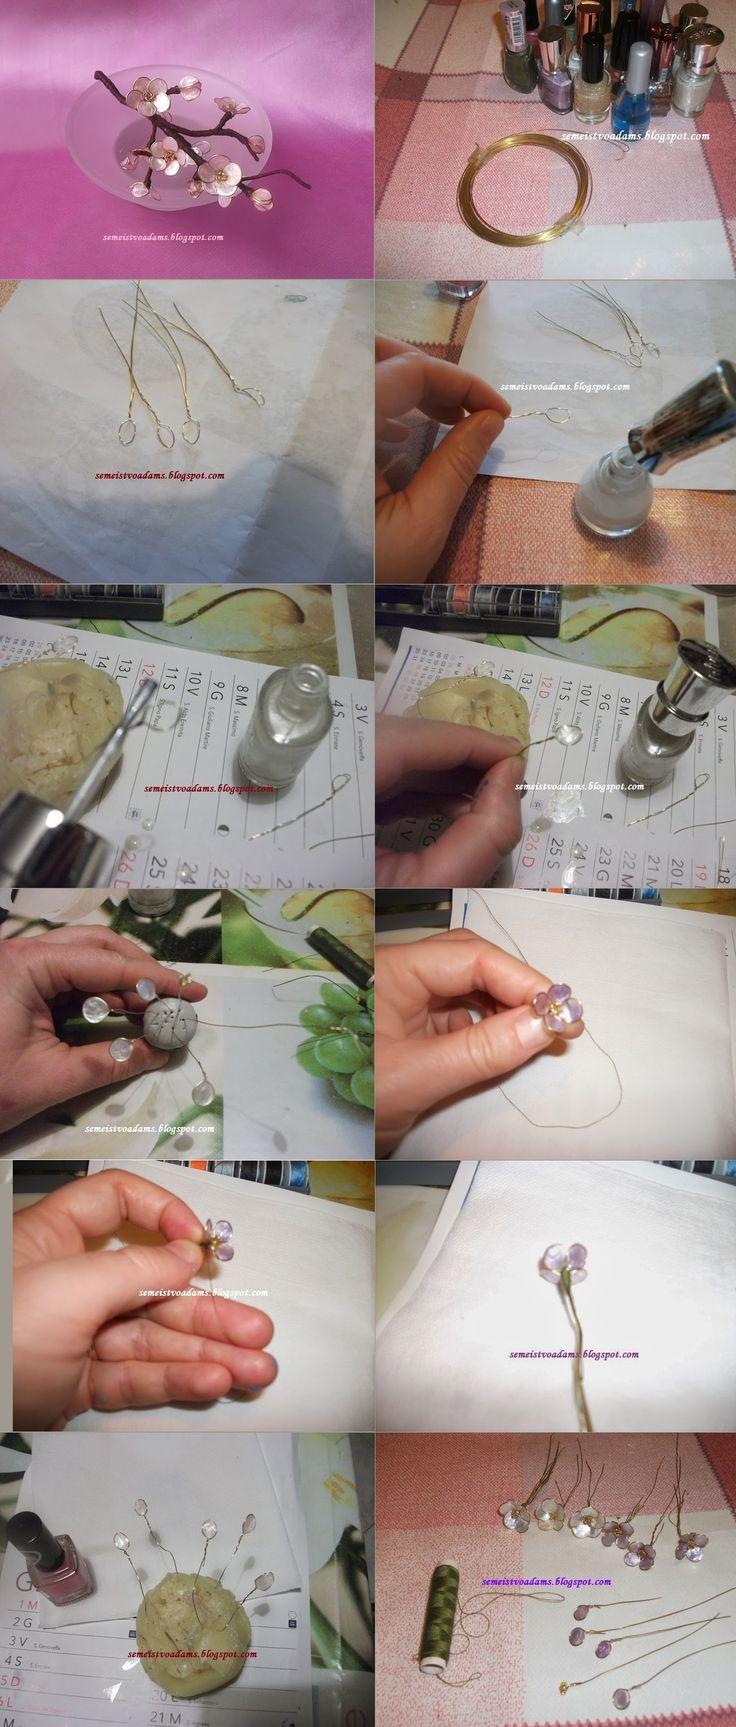 Wire cherry blossom flowers with nail polish step by step / Цветы из проволока и лака для ногтей by semeistvoadams.blogspot.com